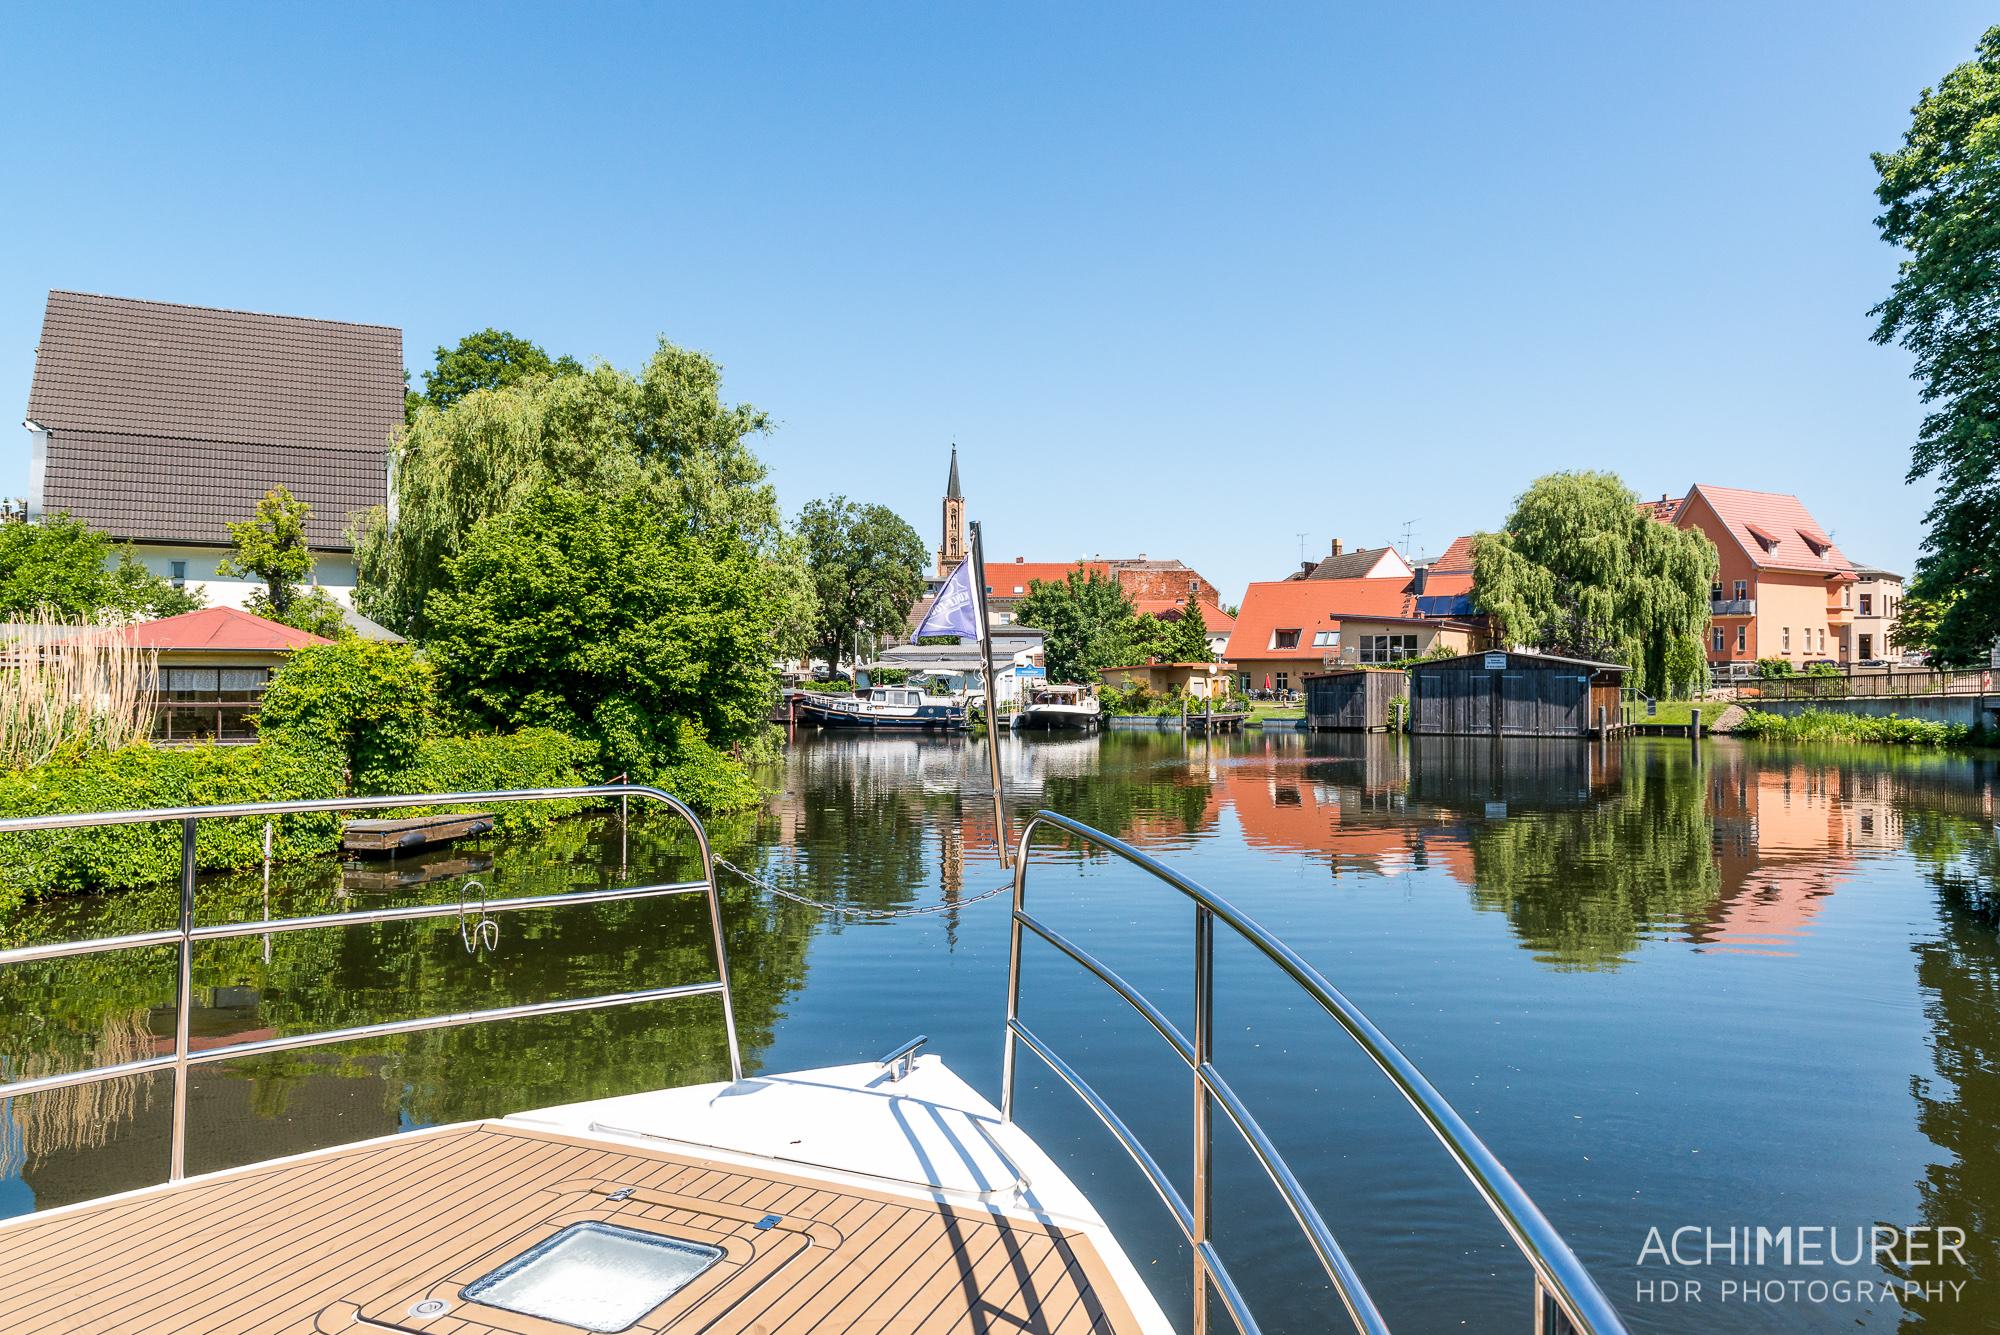 Hausboot-Kuhnle-Mueritz-Mecklenburg-Vorpommern-See_3156